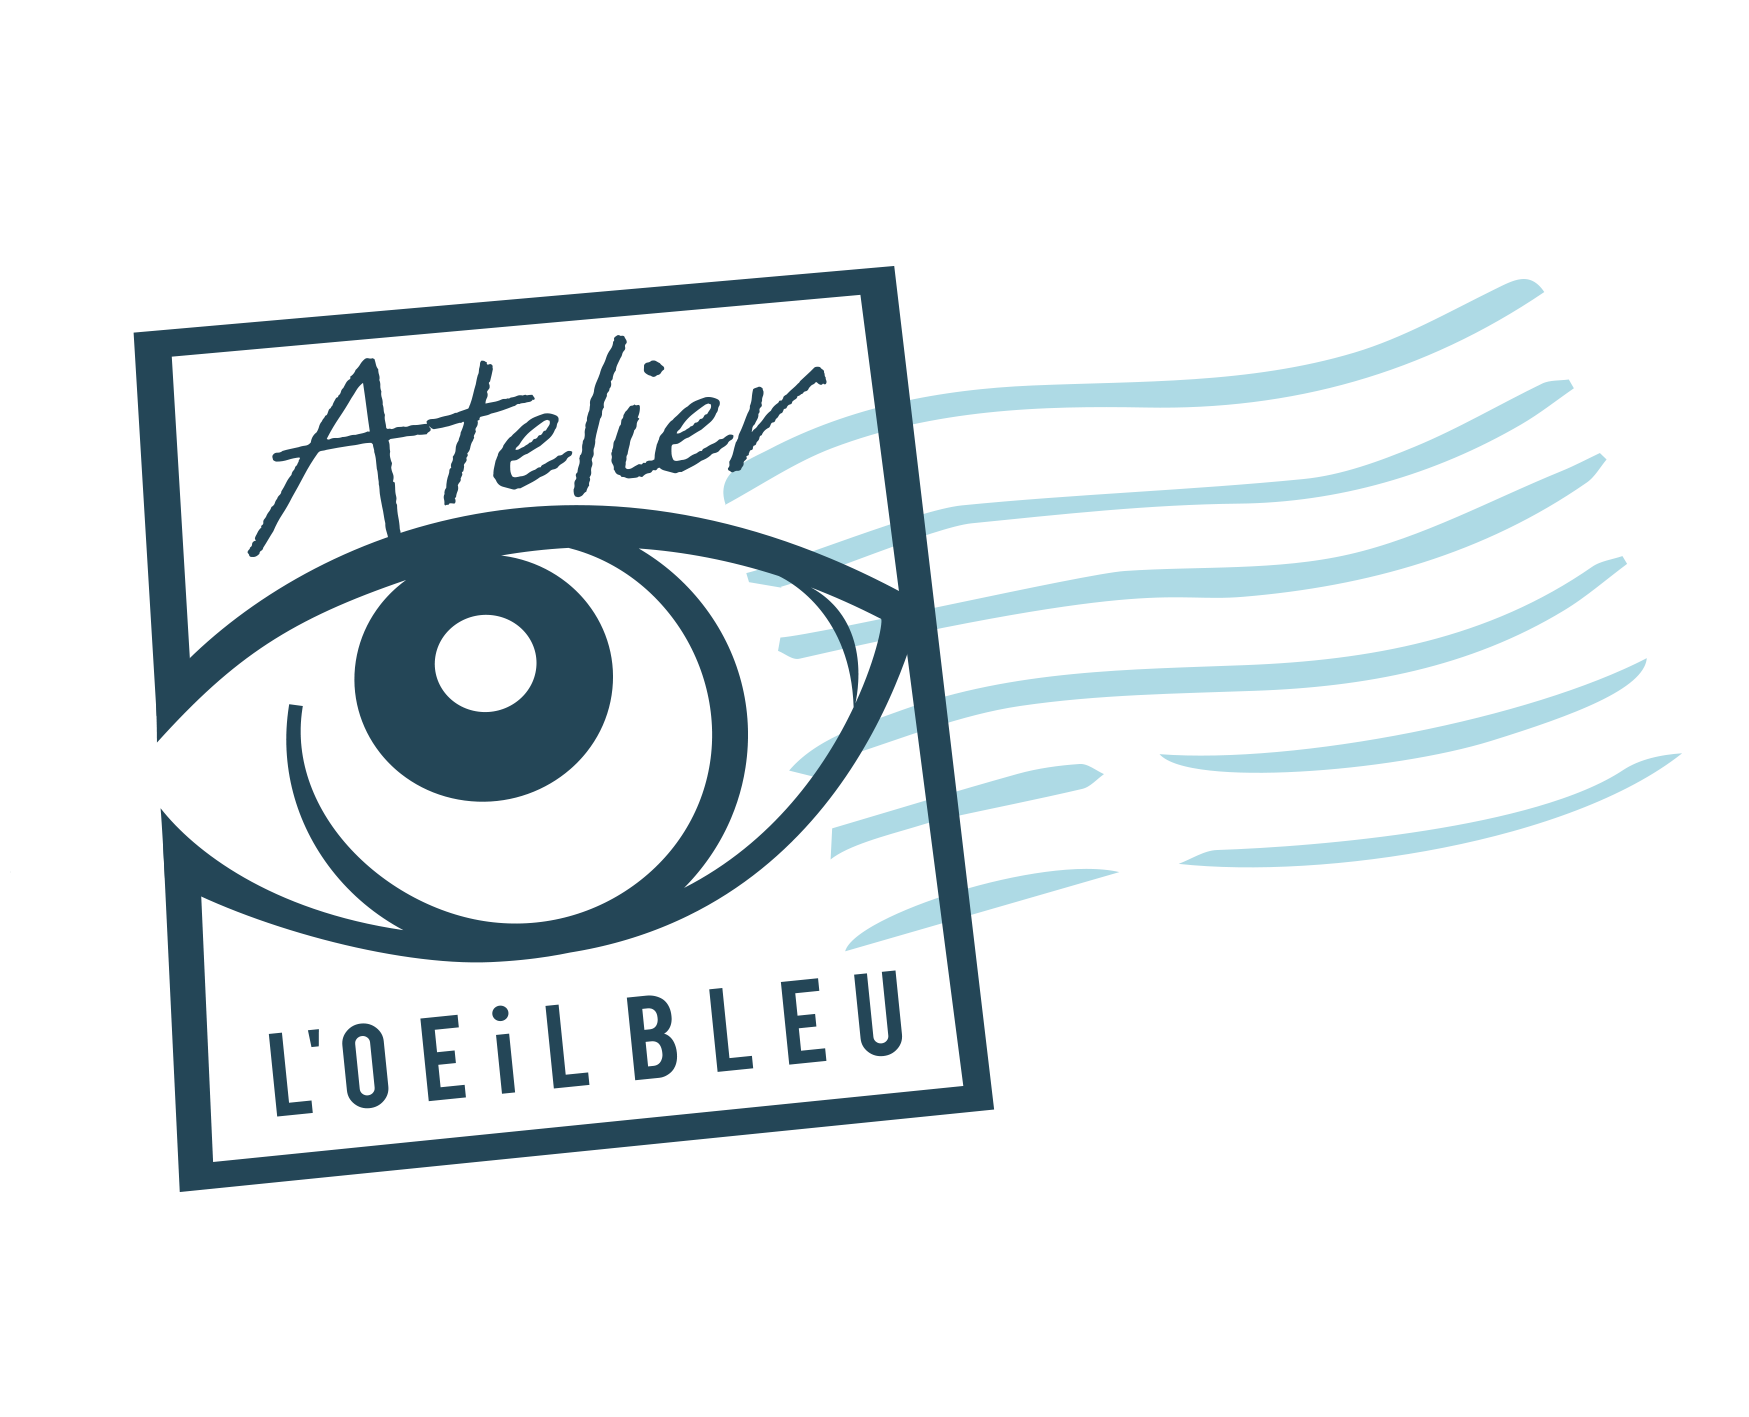 logo-id-atelier-bleu